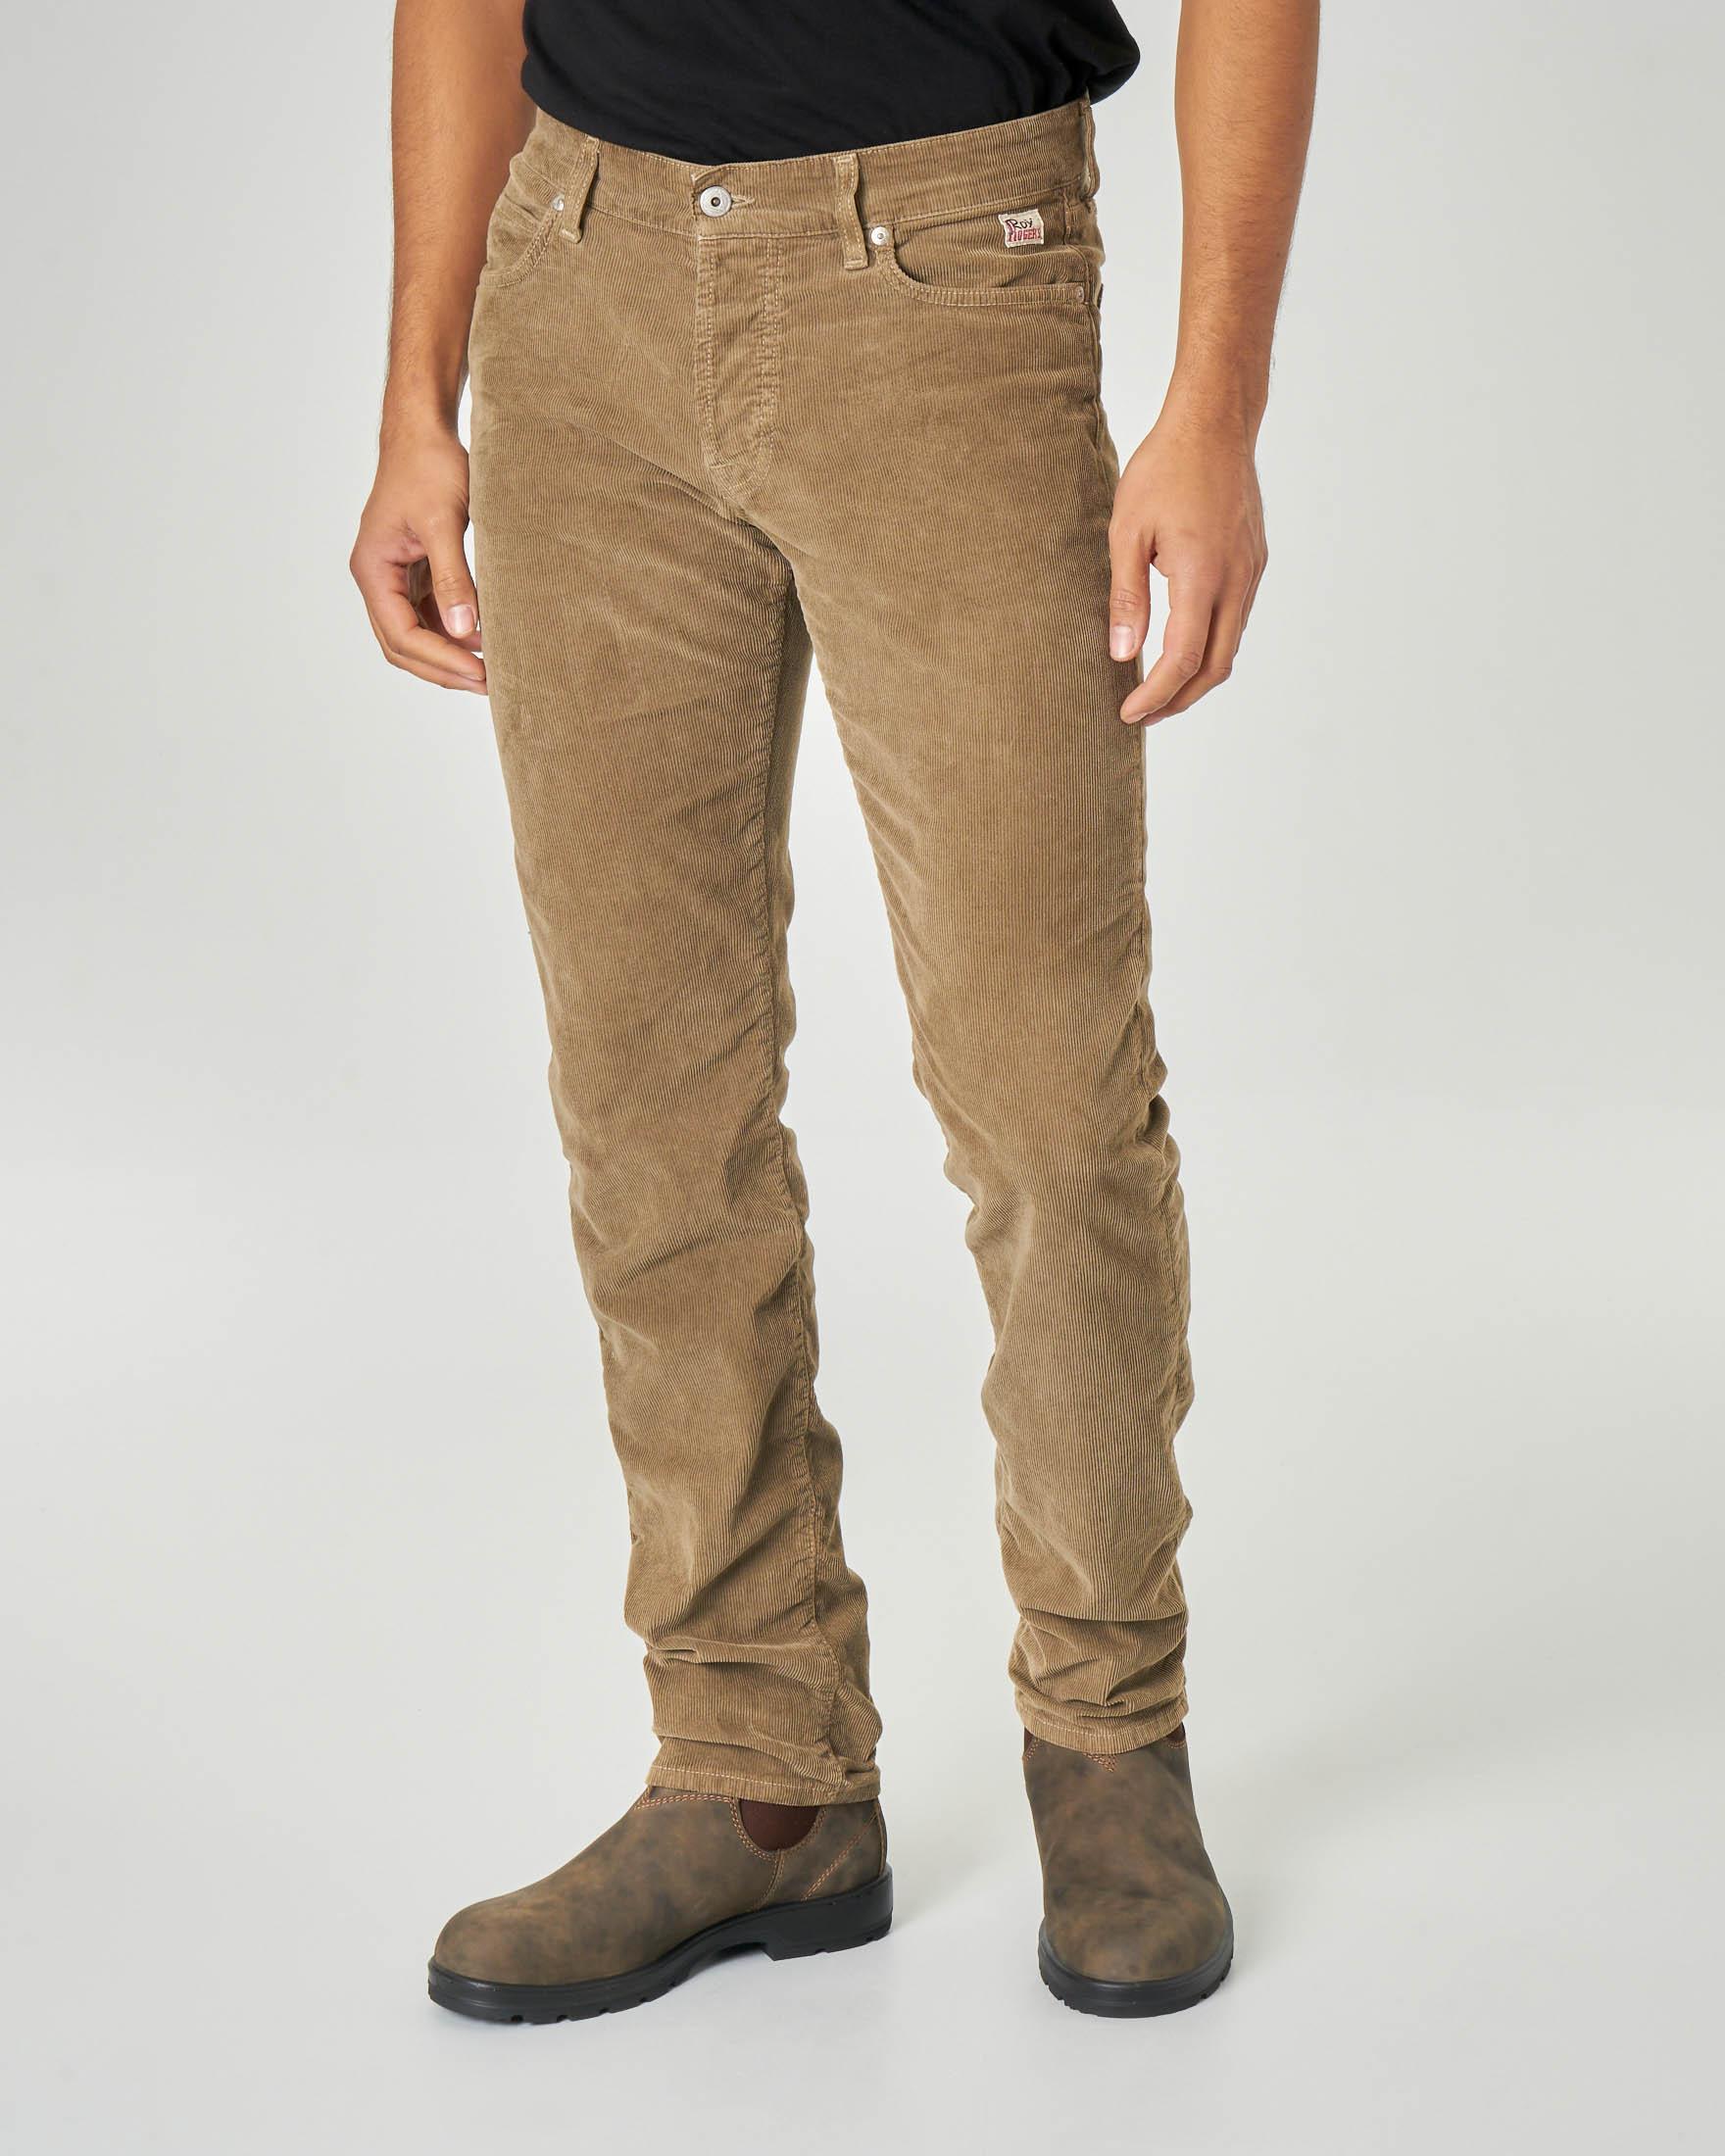 Pantalone cinque tasche beige in velluto stretch